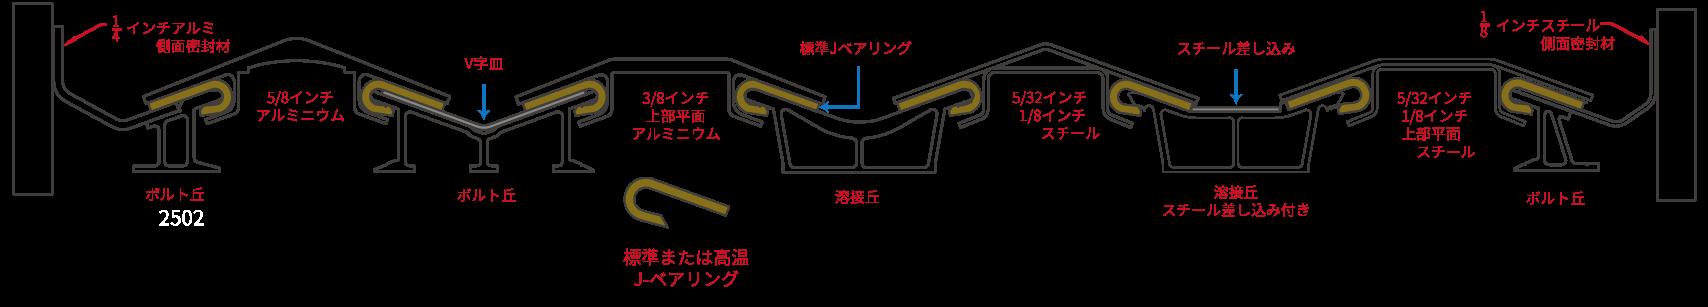 V-9シリーズ接合例